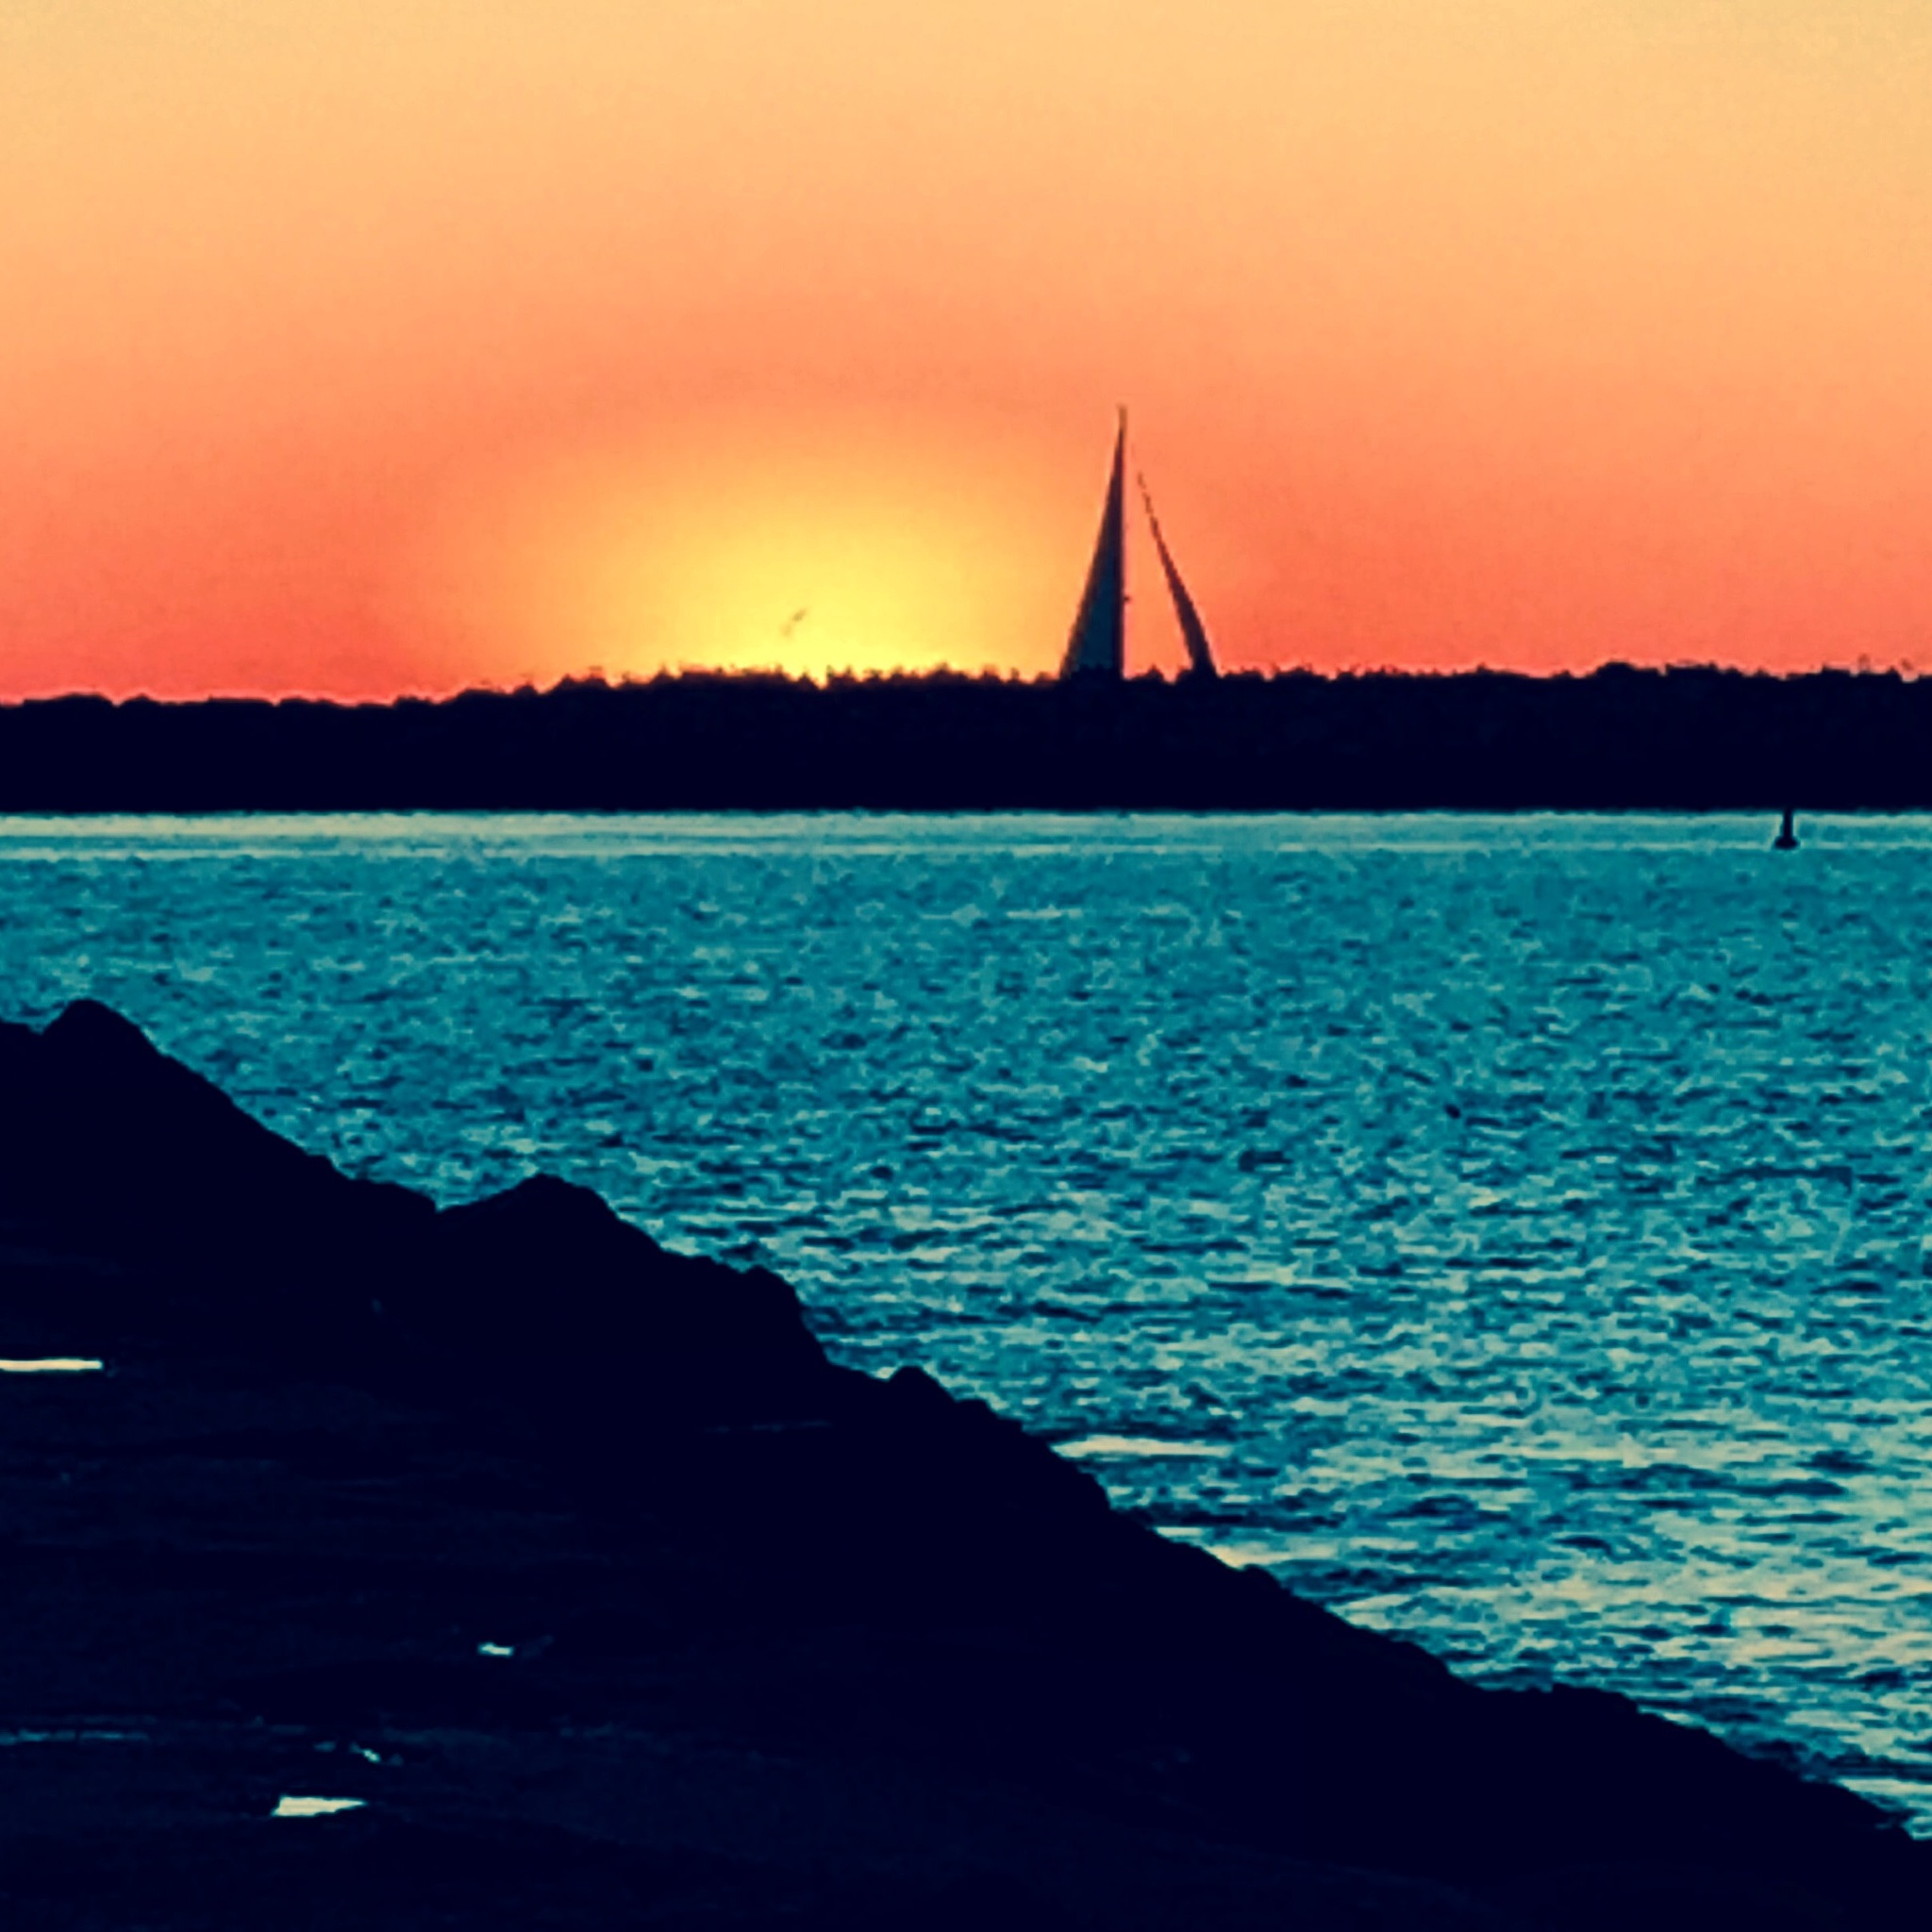 Colors calm the sea by maryann.mishko